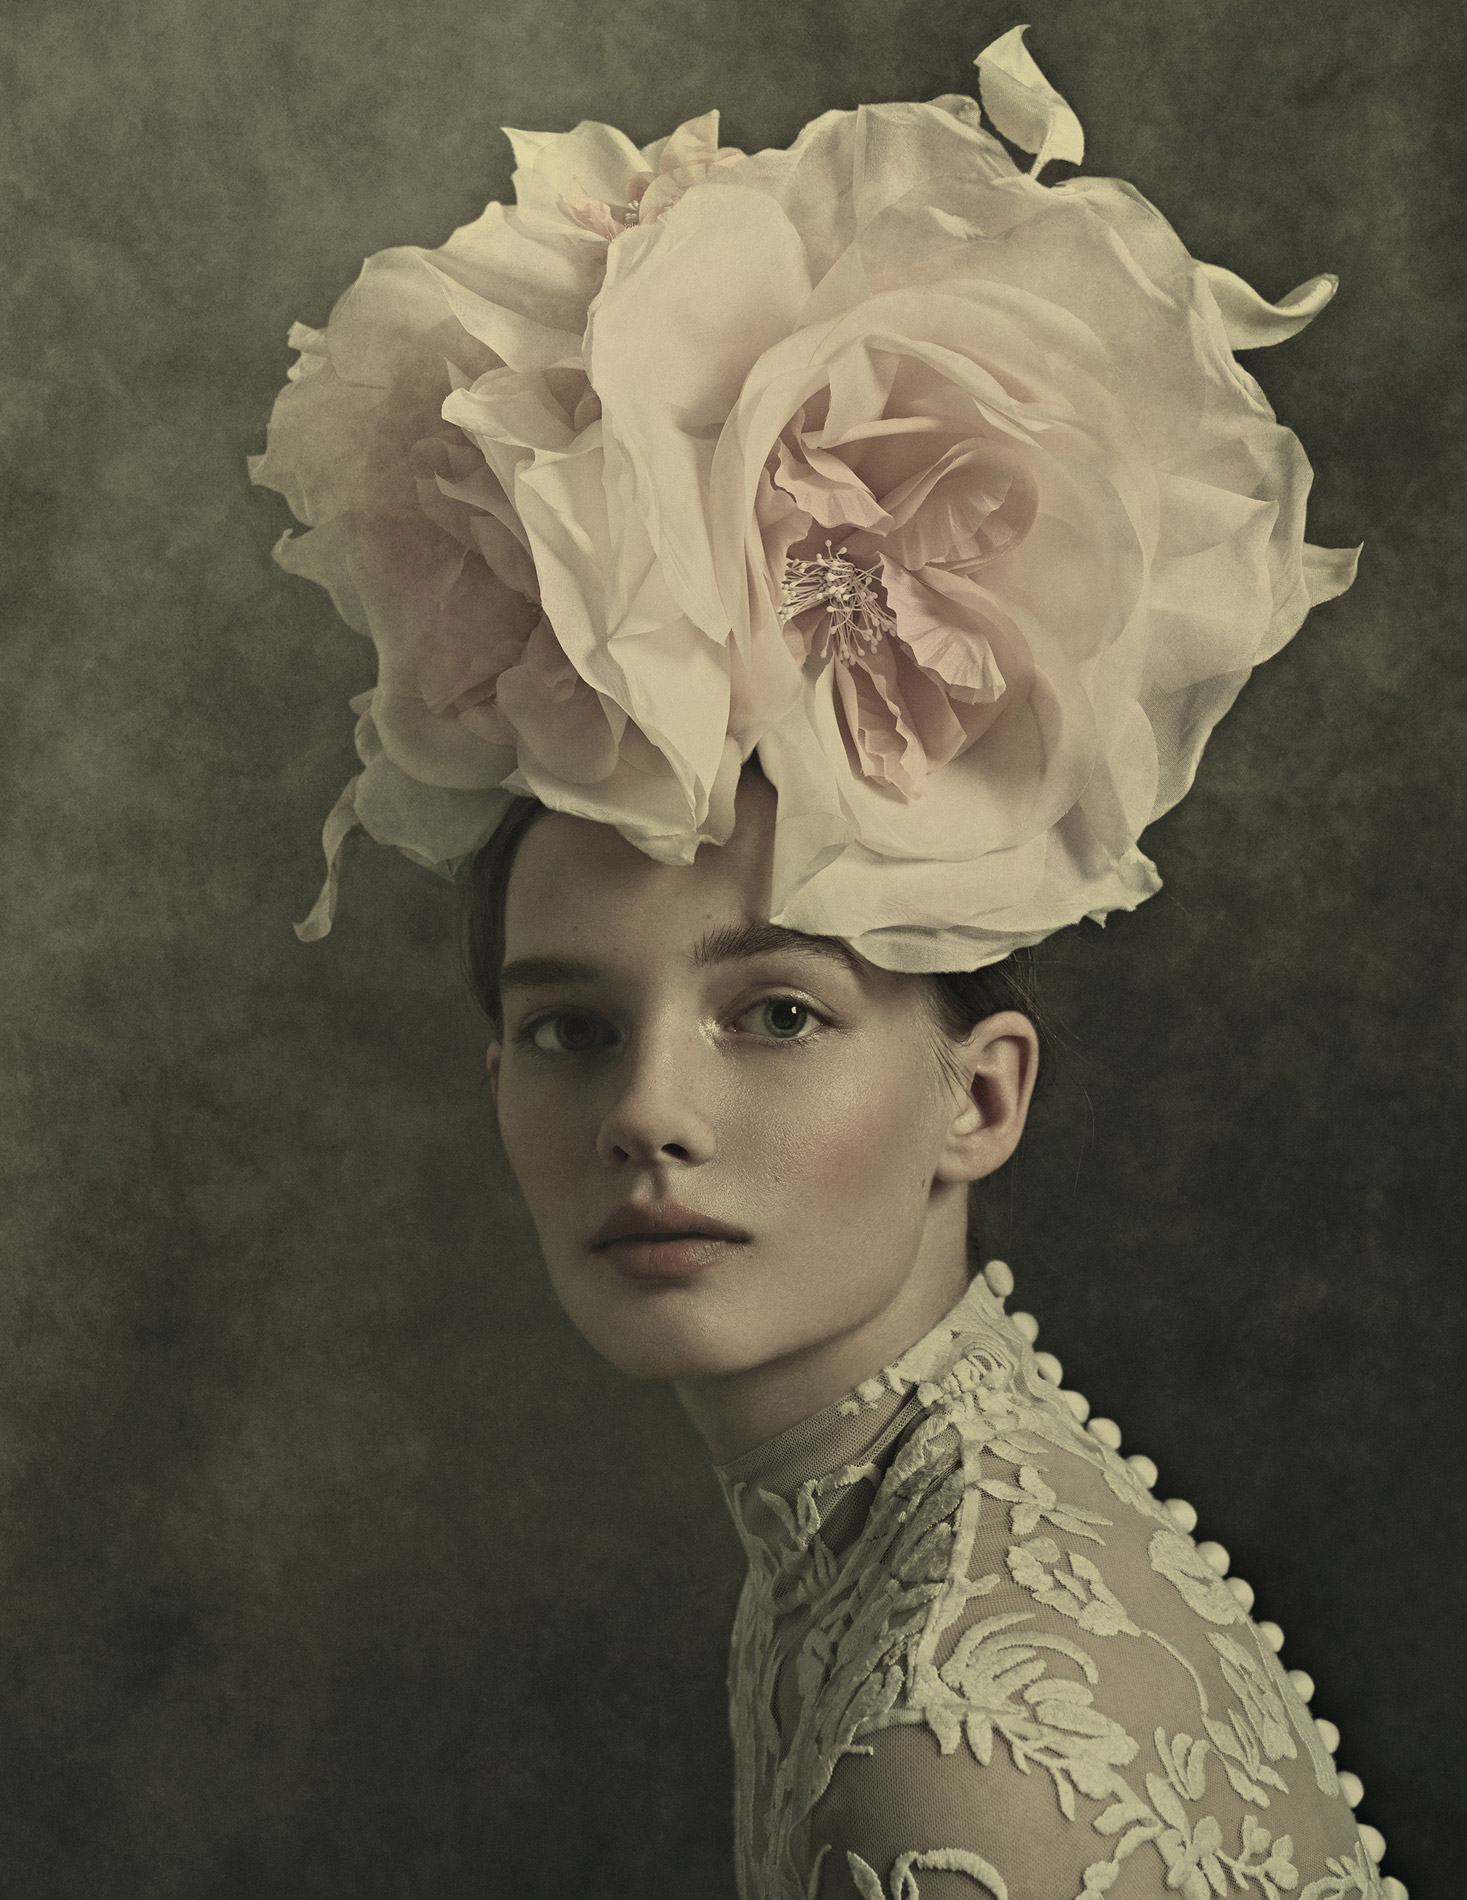 Condé Nast brides - Carl Bengtsson / skarp photography